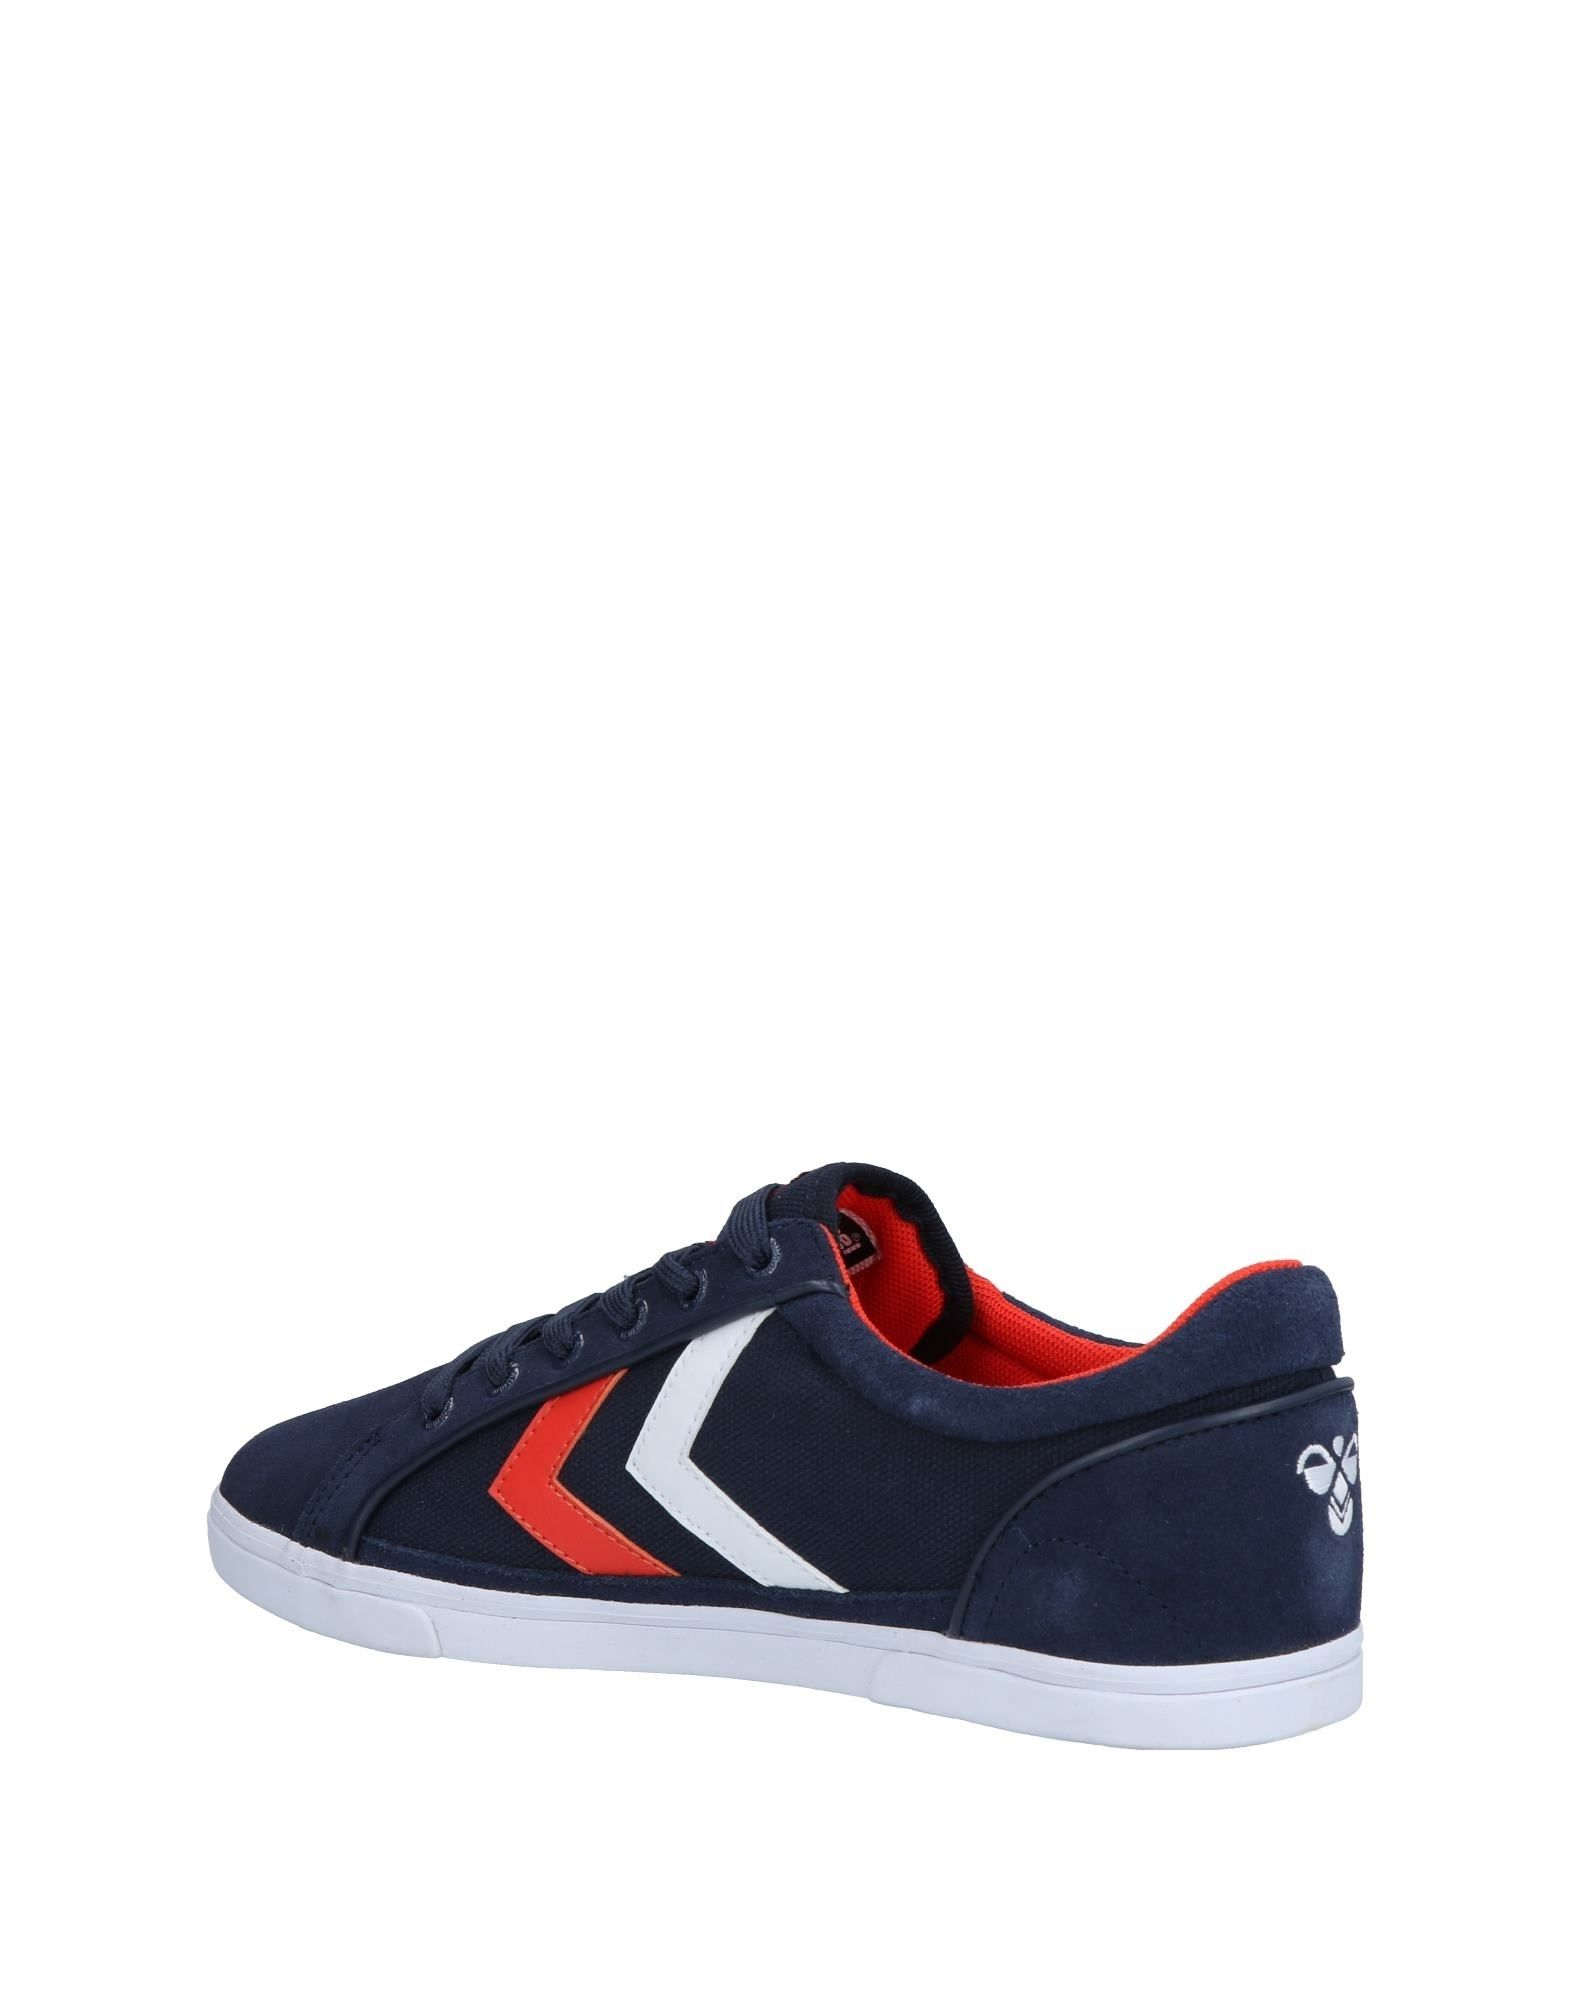 Hummel Sneakers online - Men Hummel Sneakers online Sneakers on  Australia - 11487406DO 8b0df9